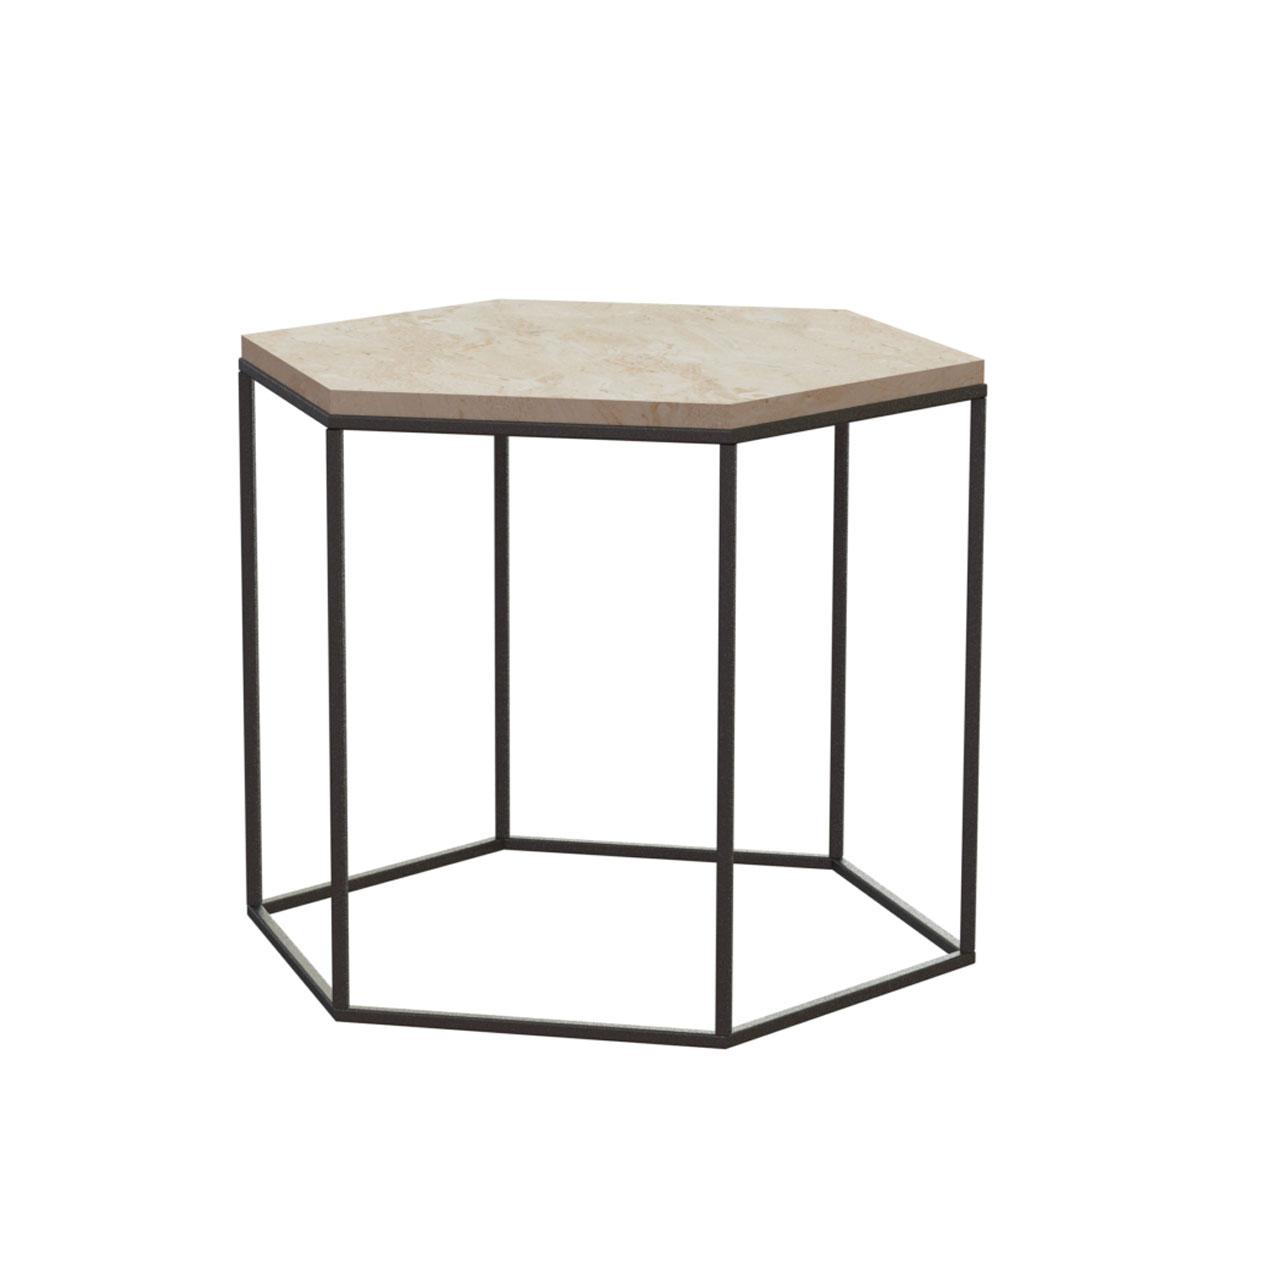 میز جلو مبلی کد19337